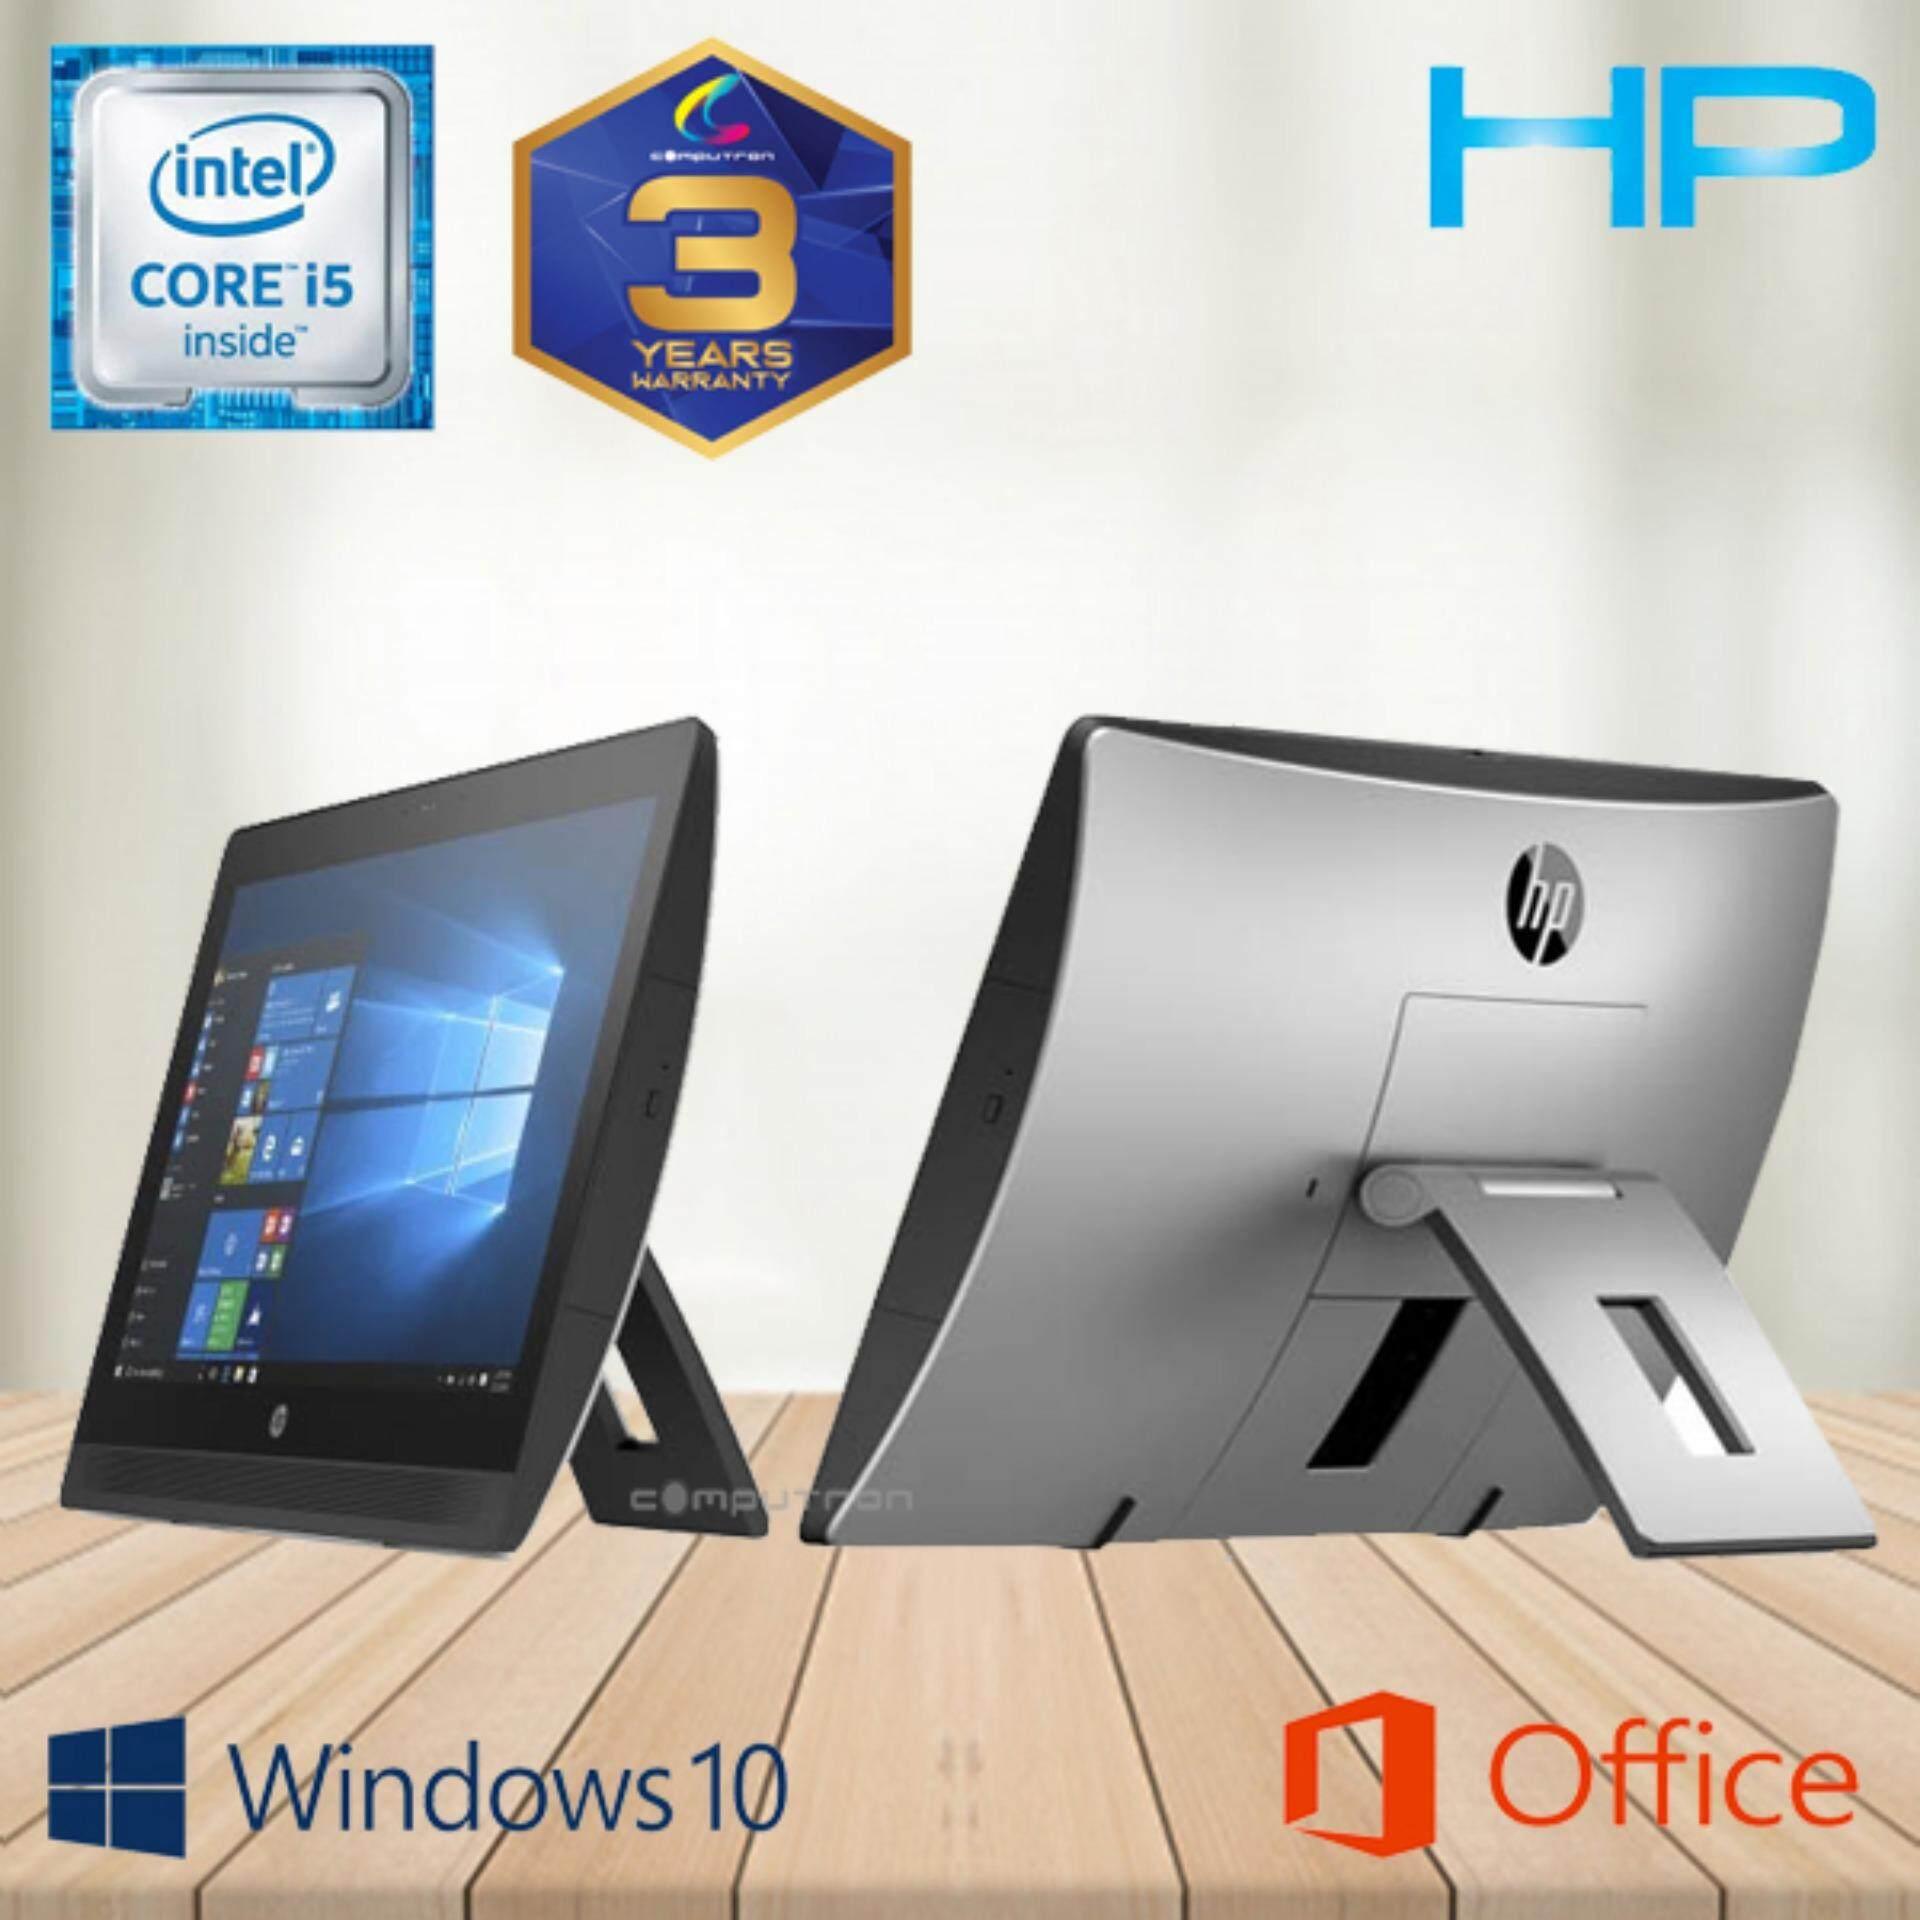 HP PRO ONE 400 (G2) ALL-IN-ONE CORE I5-6TH GENERATION SUPERDUTY PC [ 3 YEAR  WARRANTY] [ DESKTOP ]